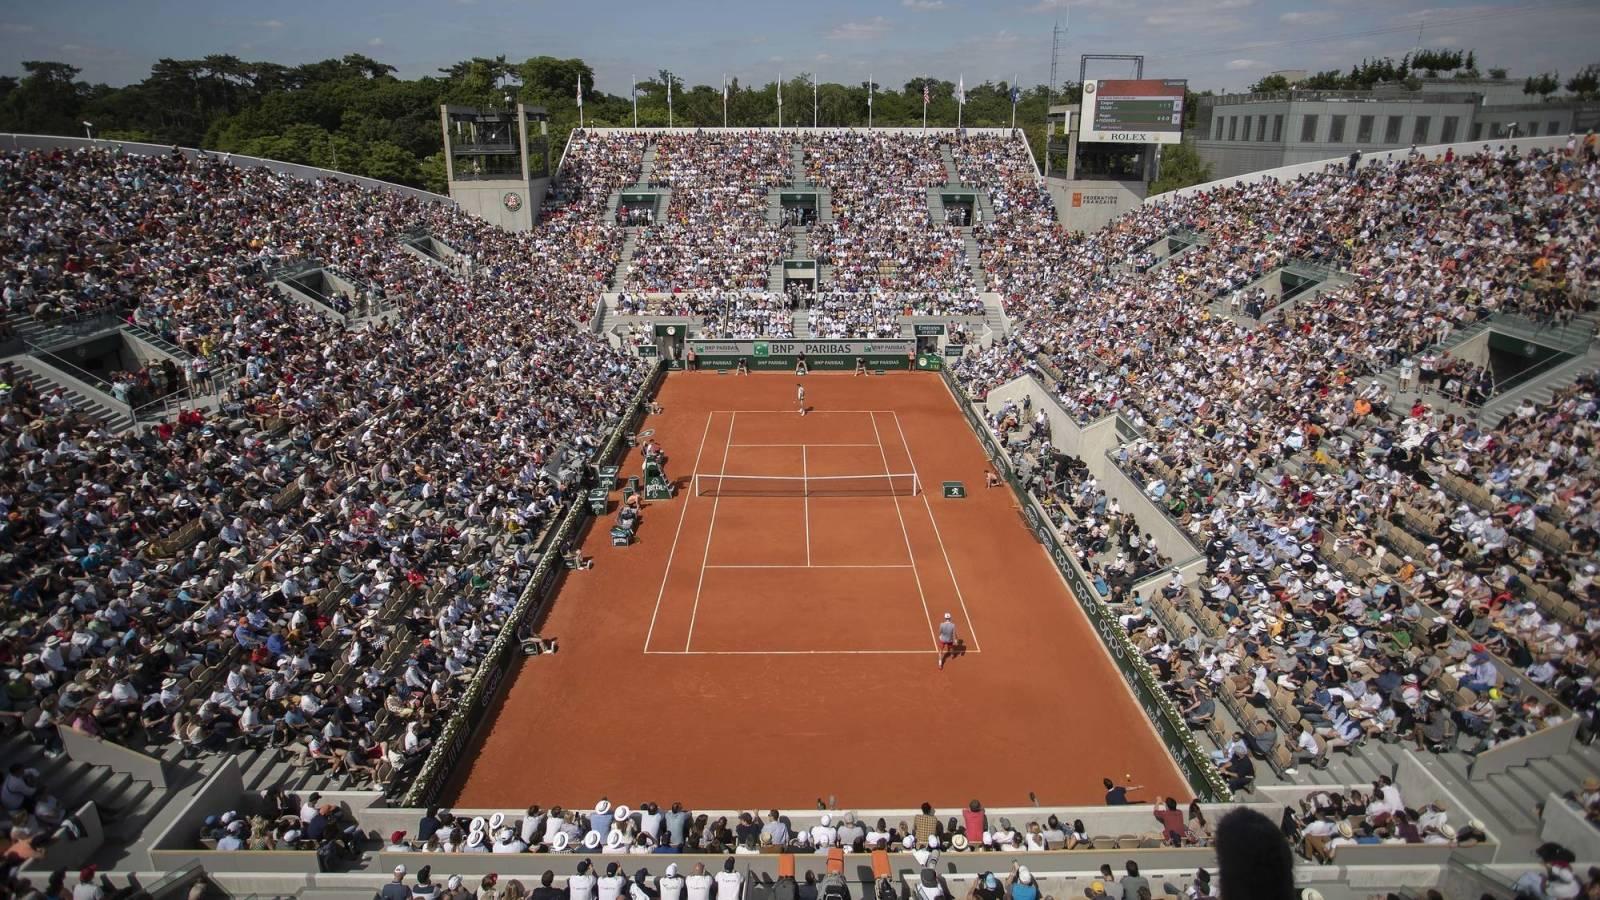 French Open fans